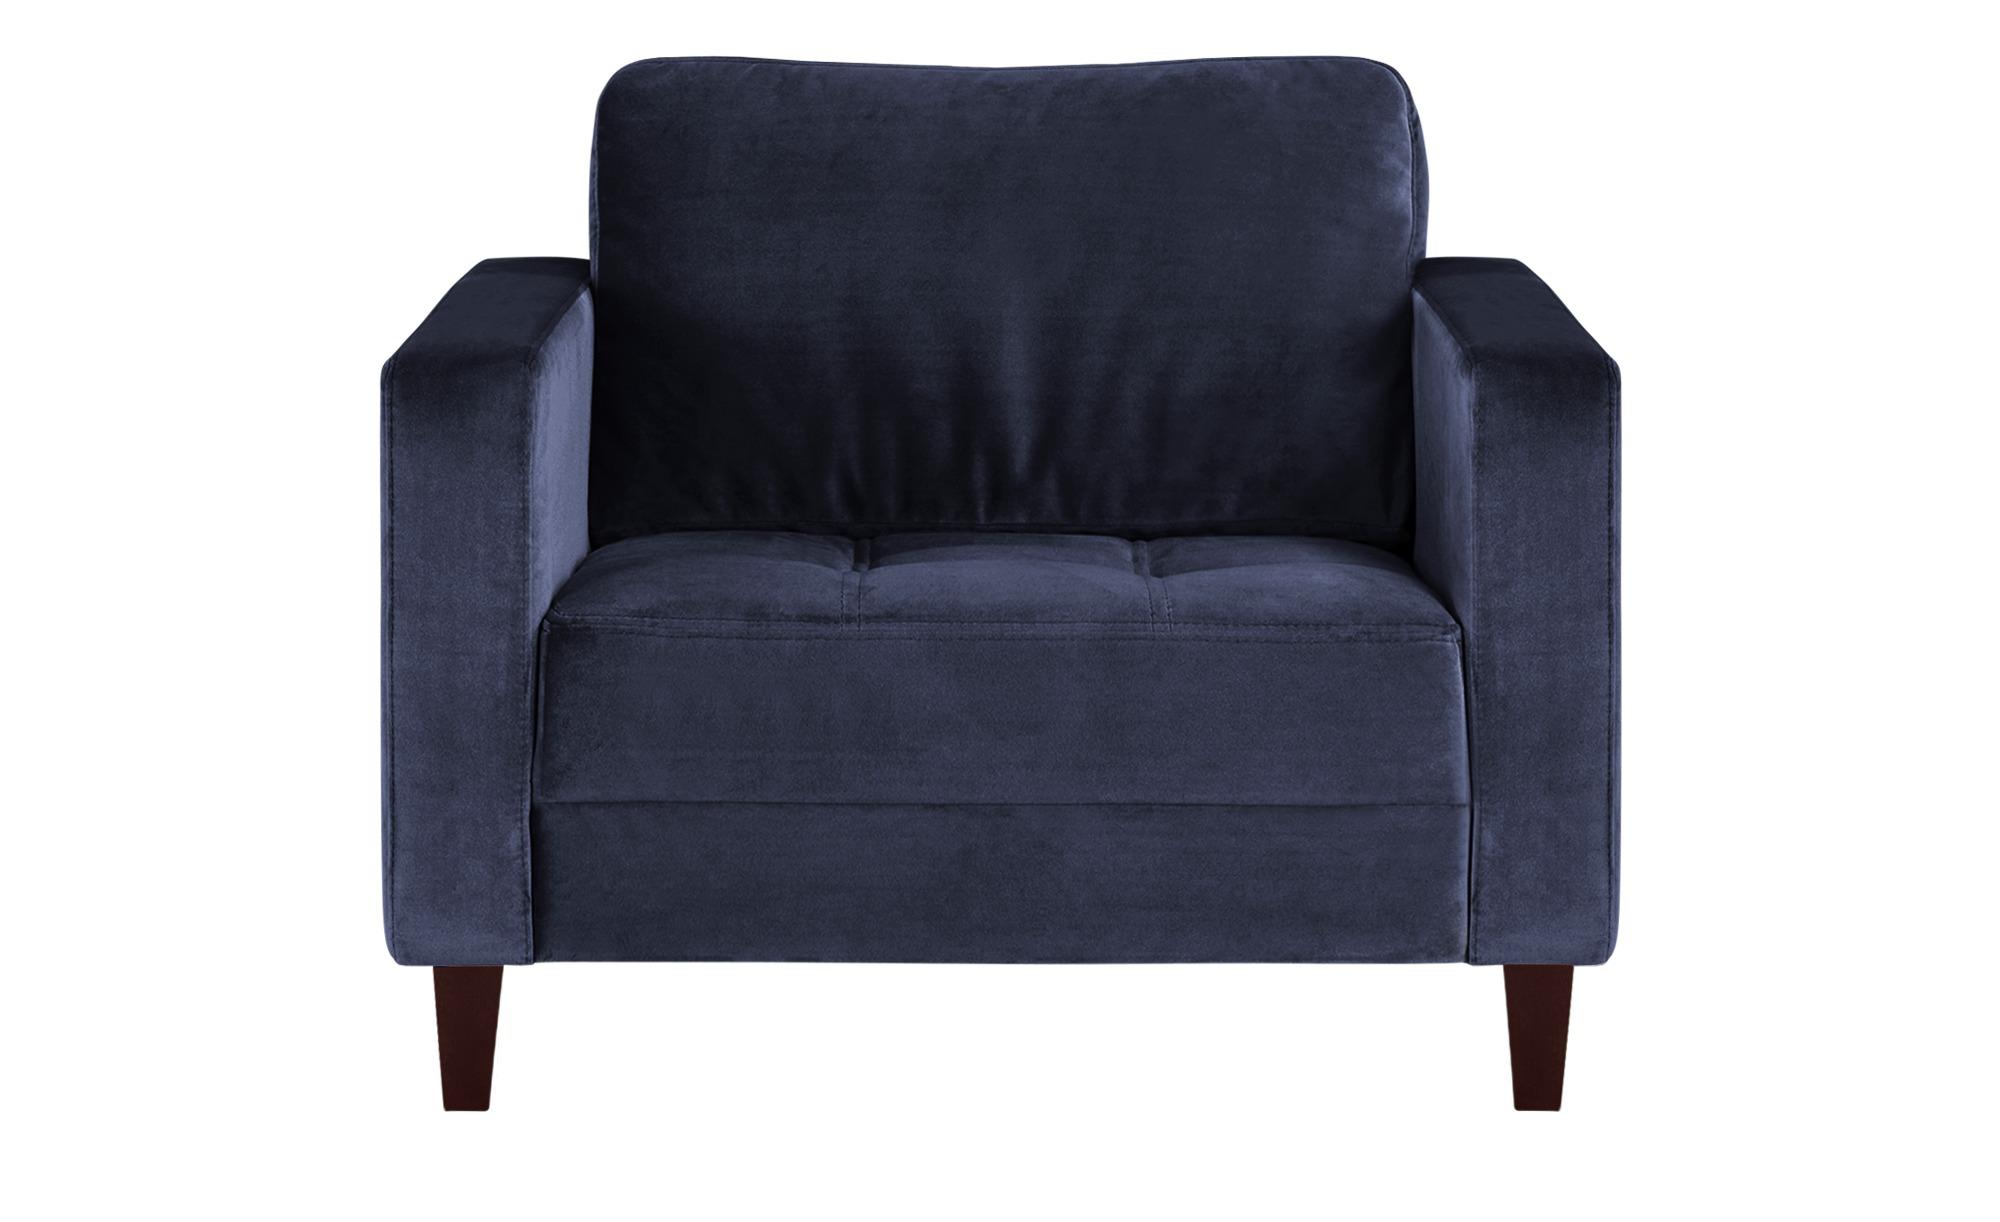 smart Sessel blau - Stoff Geradine ¦ blau ¦ Maße (cm): B: 102 H: 83 T: 91 Polstermöbel > Sessel > Polstersessel - Höffner